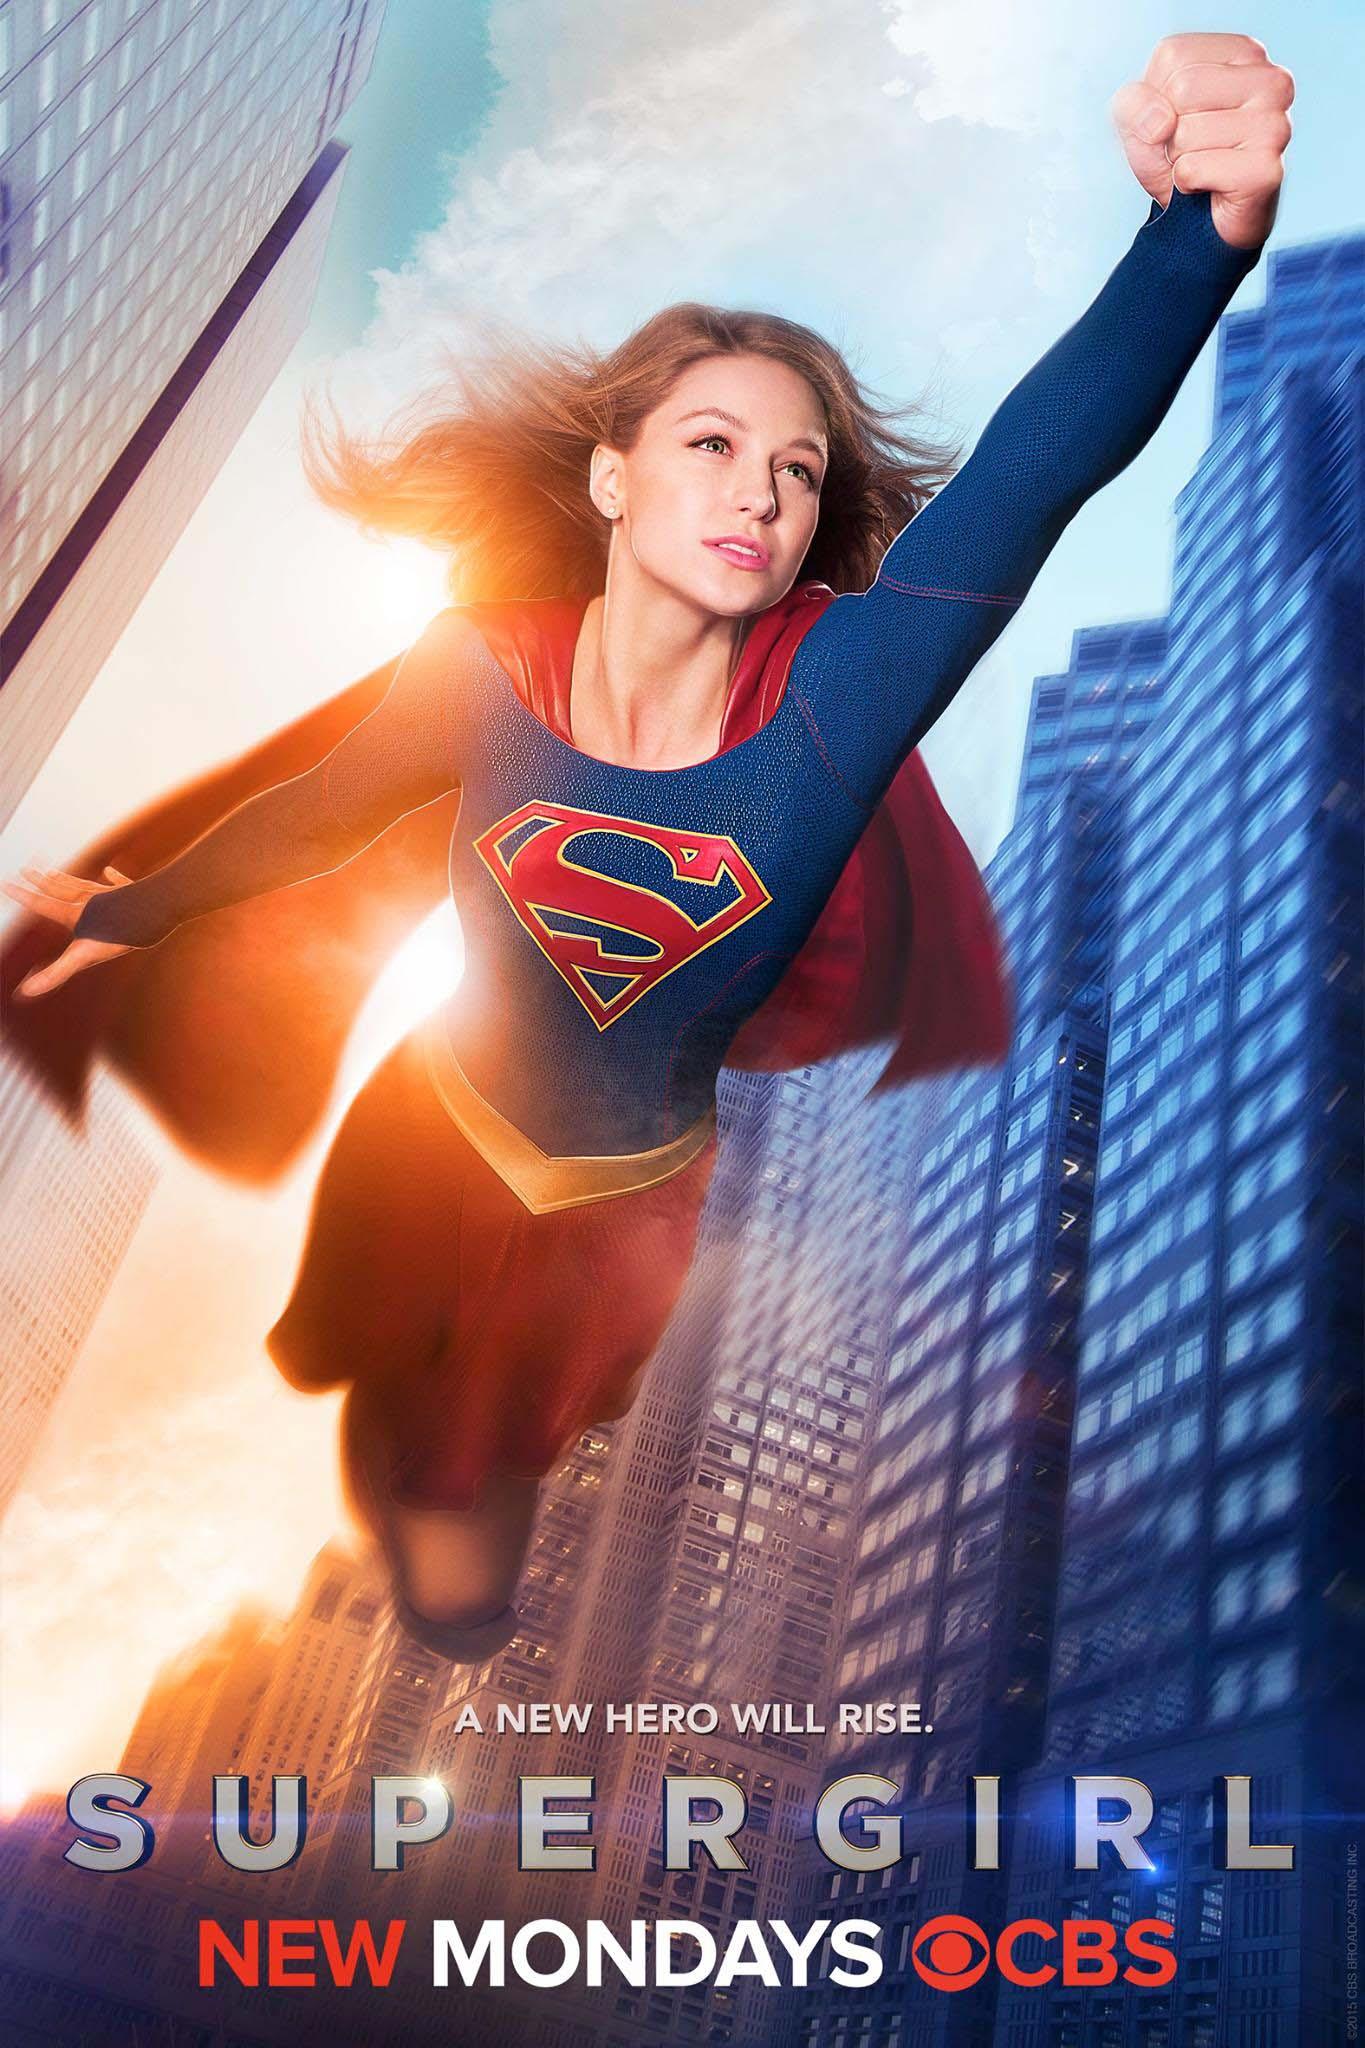 Supergirl.S01E20.HDTV.XviD-FUM[ettv]